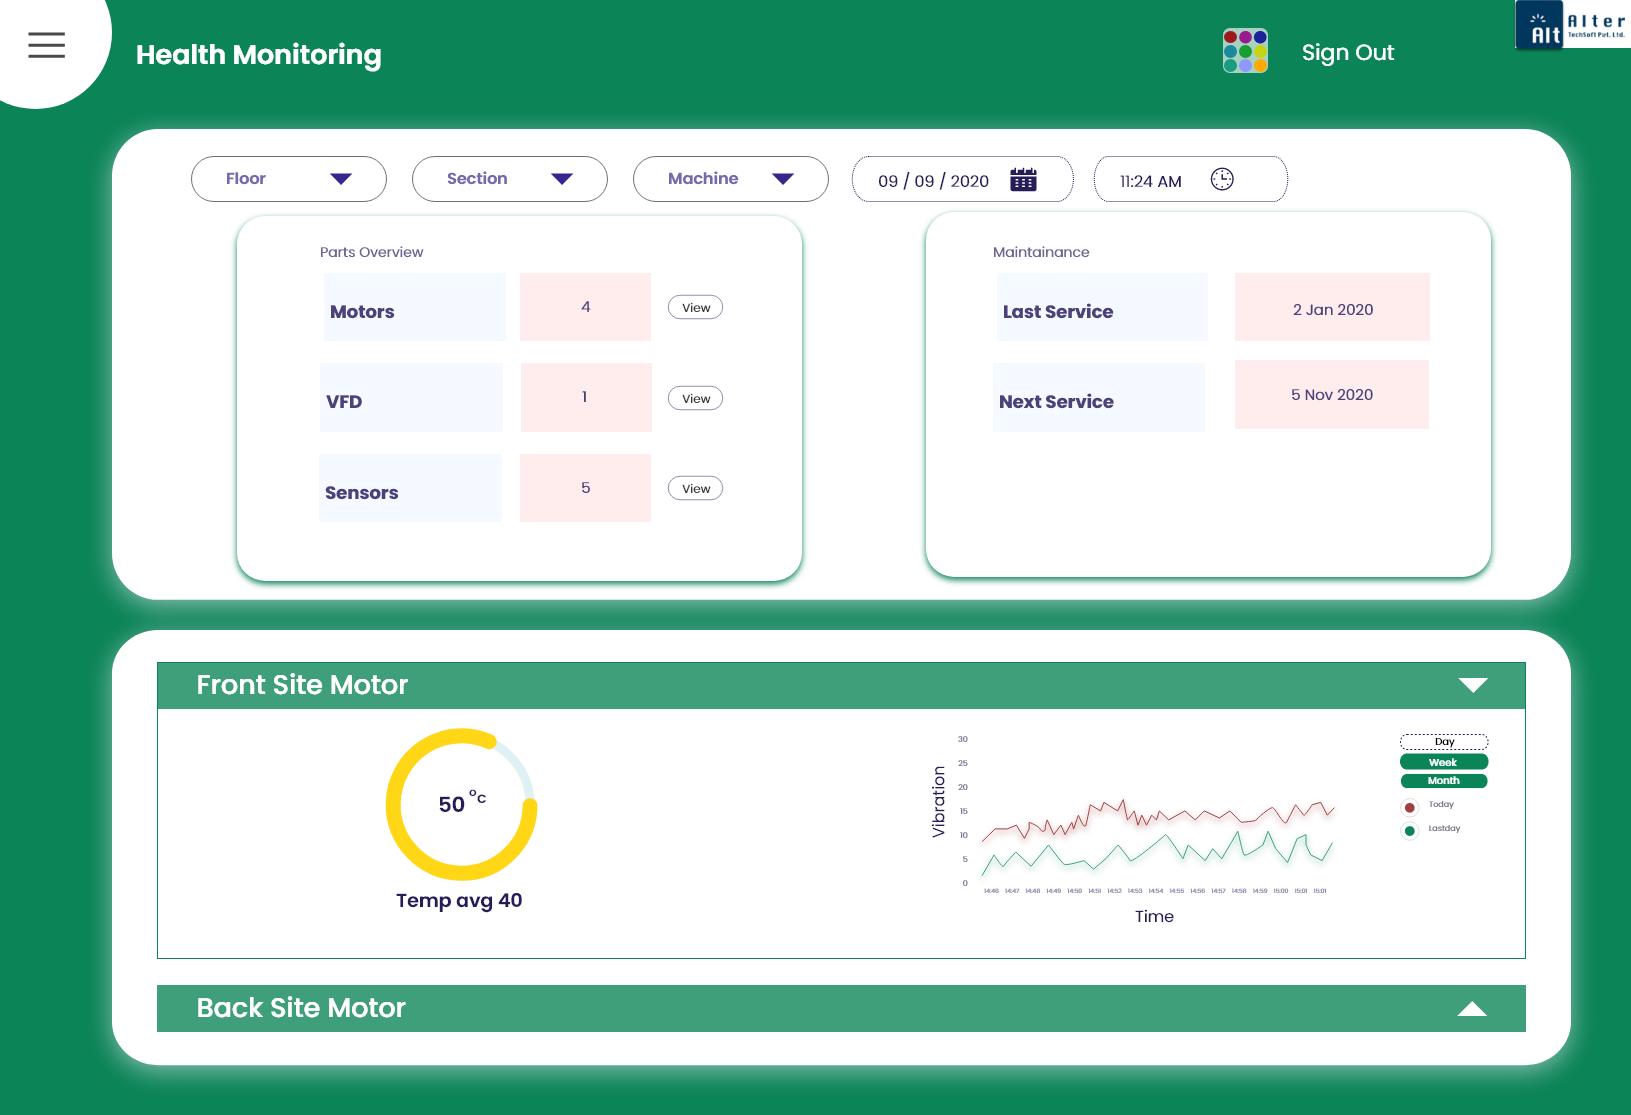 Atspl-IOT-Health-Monitoring-Dashboard